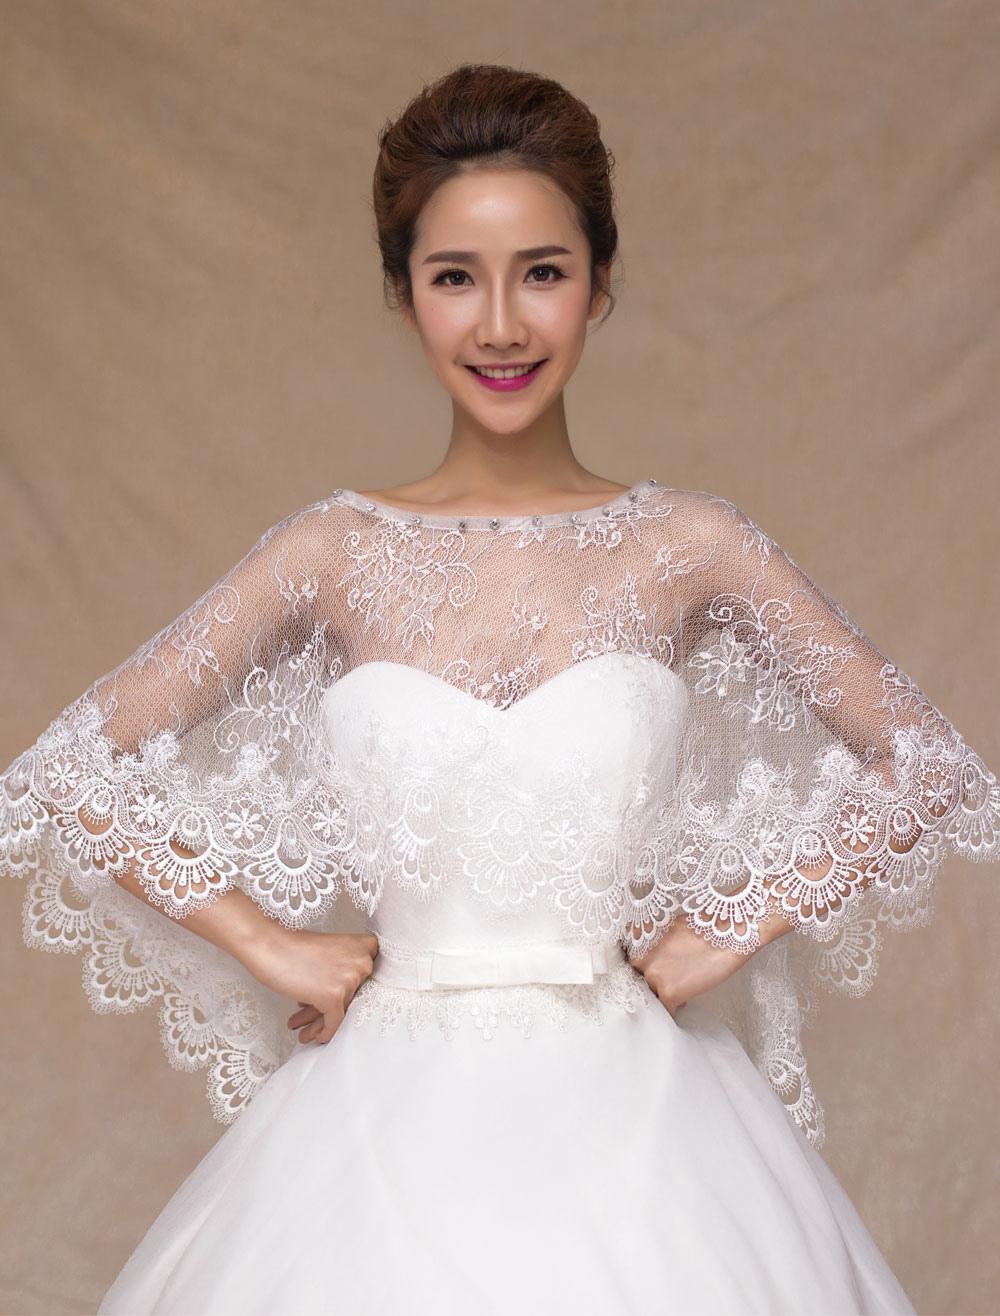 Ivory Semi-Sheer Lace Wedding Shawl for Women